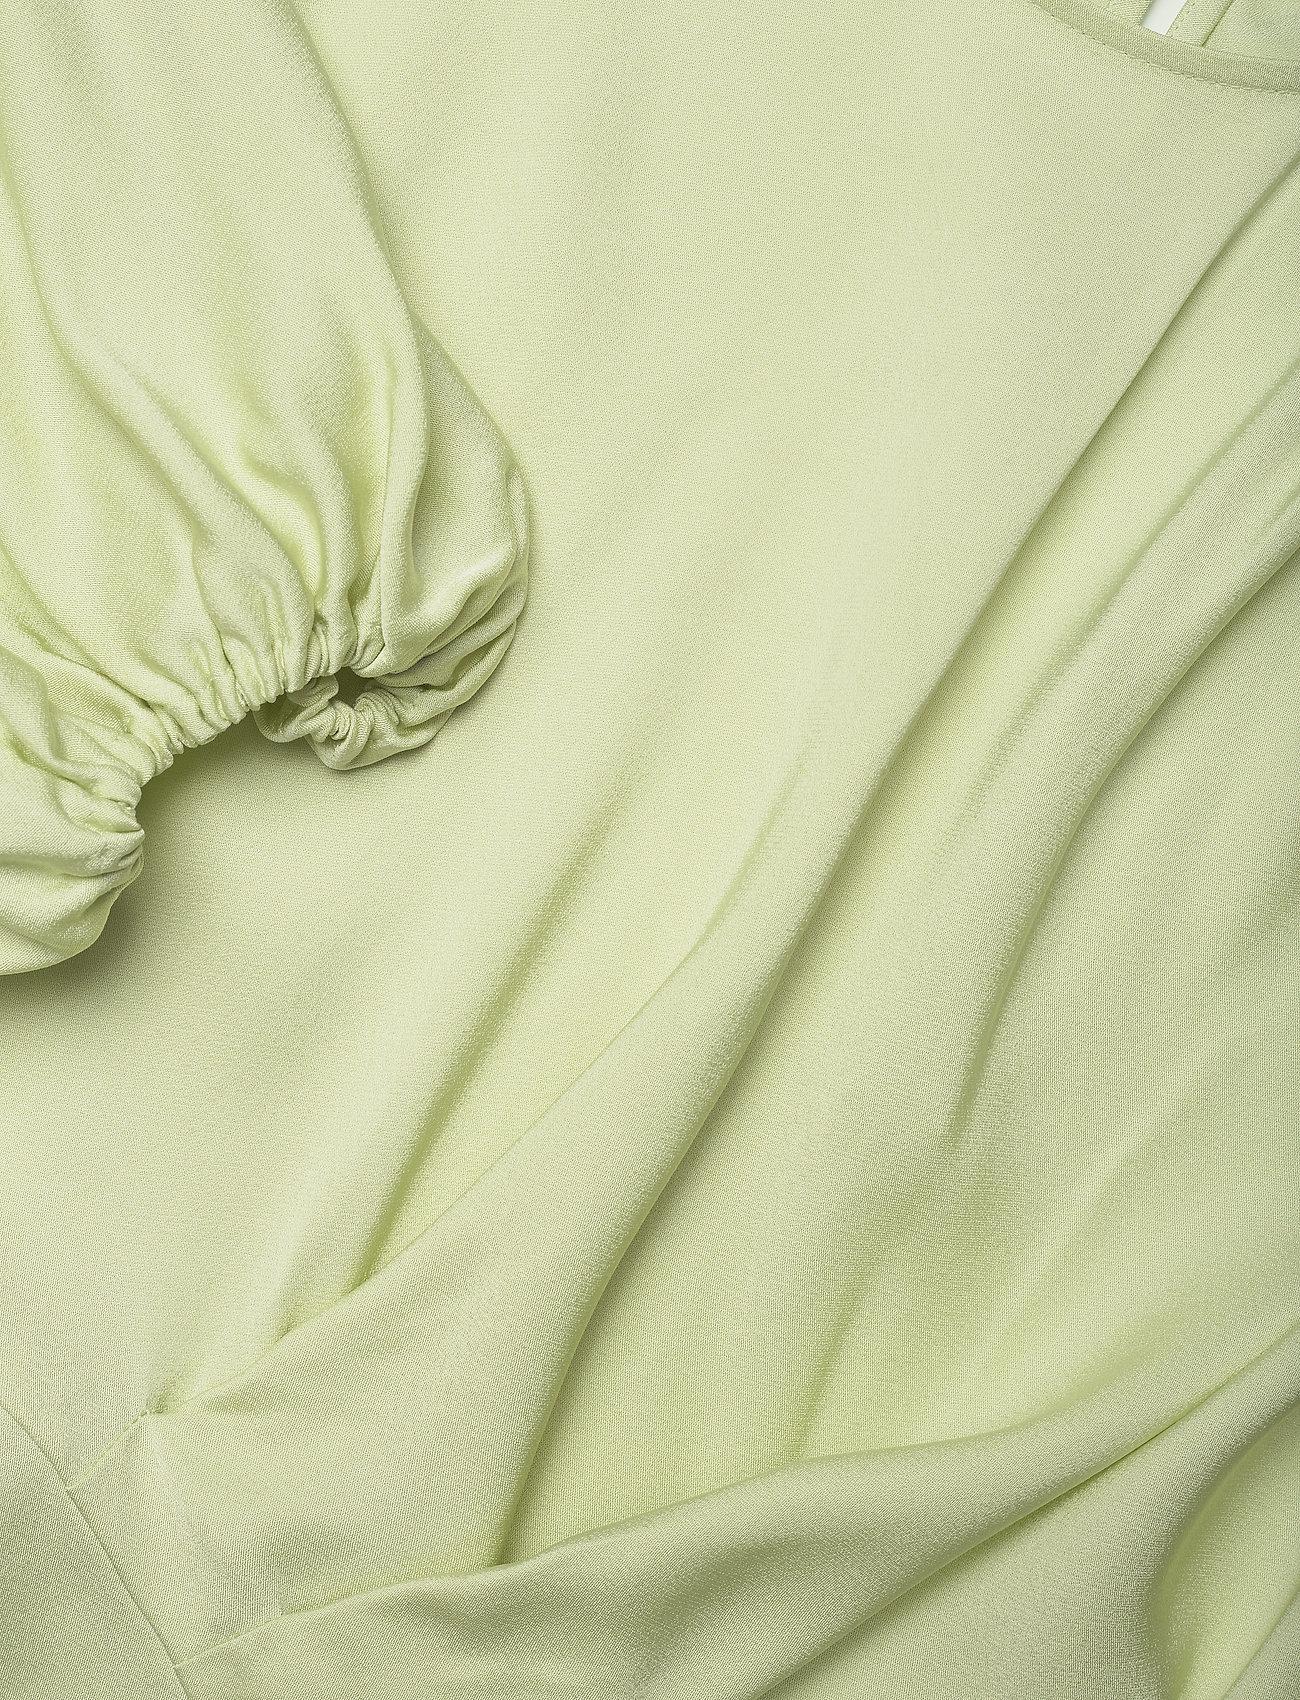 STINE GOYA - Cora, 1110 Viscose Twill - kortærmede bluser - fog green - 3